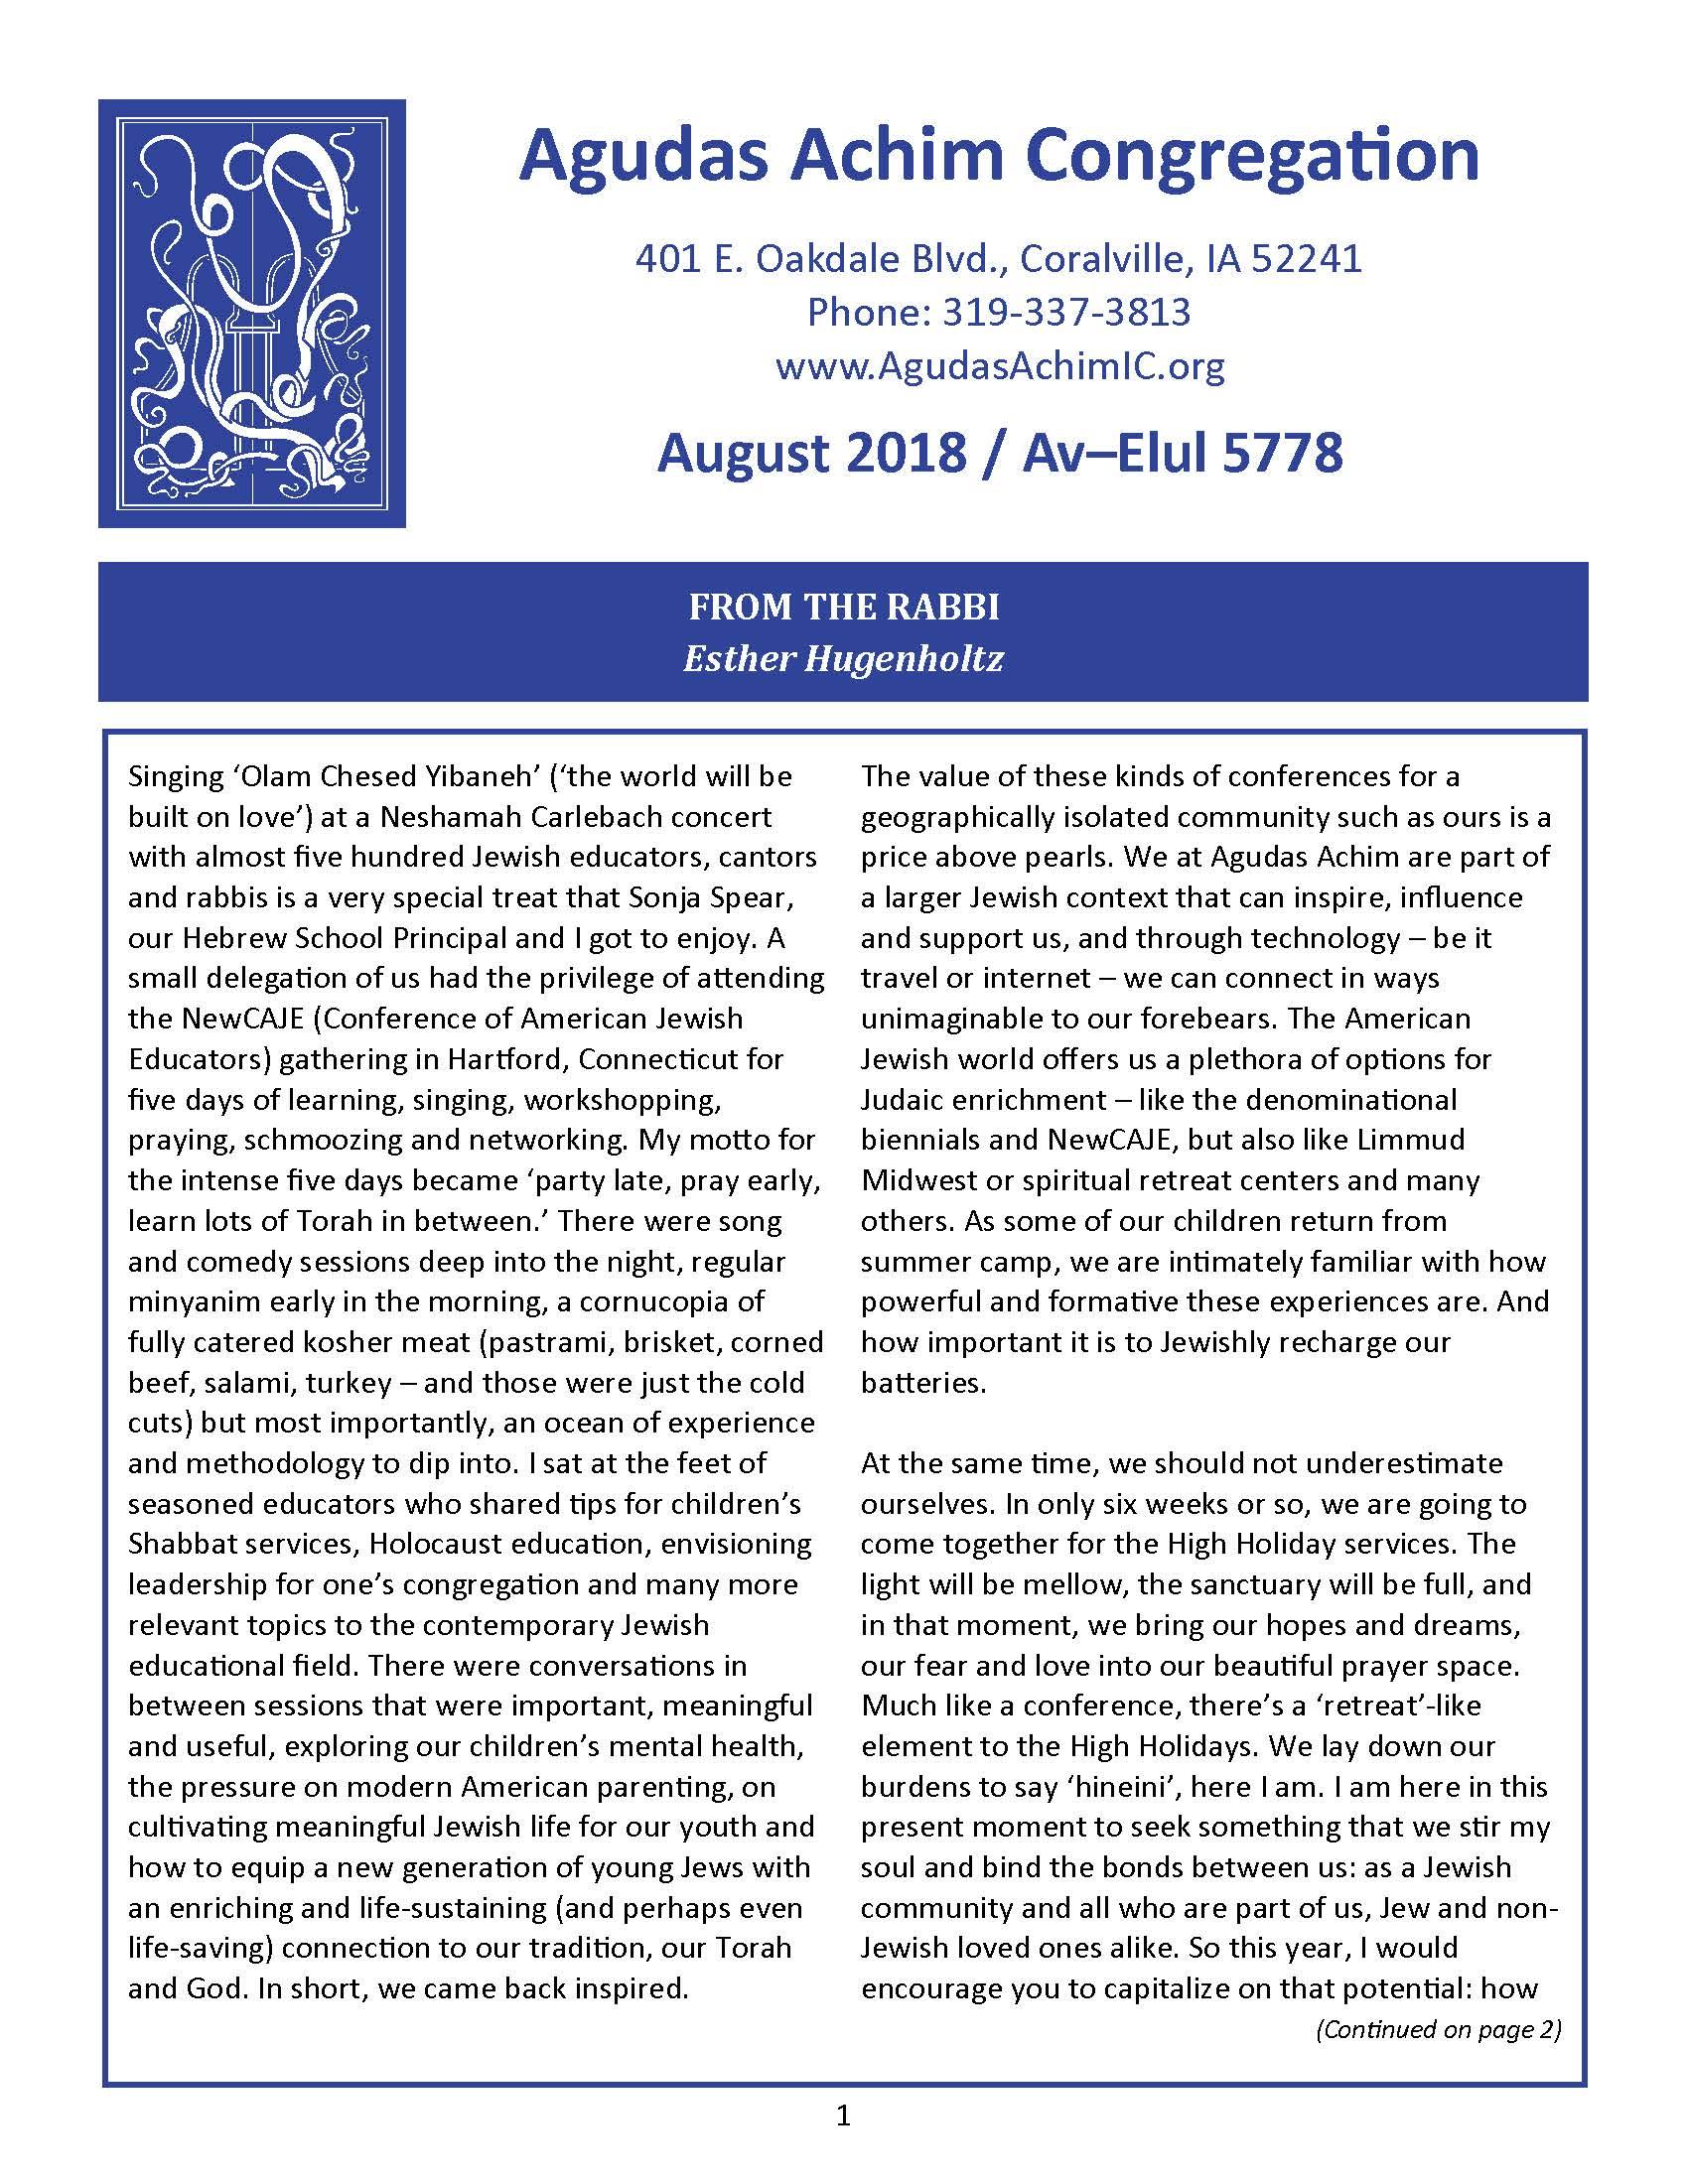 August 2018 Bulletin